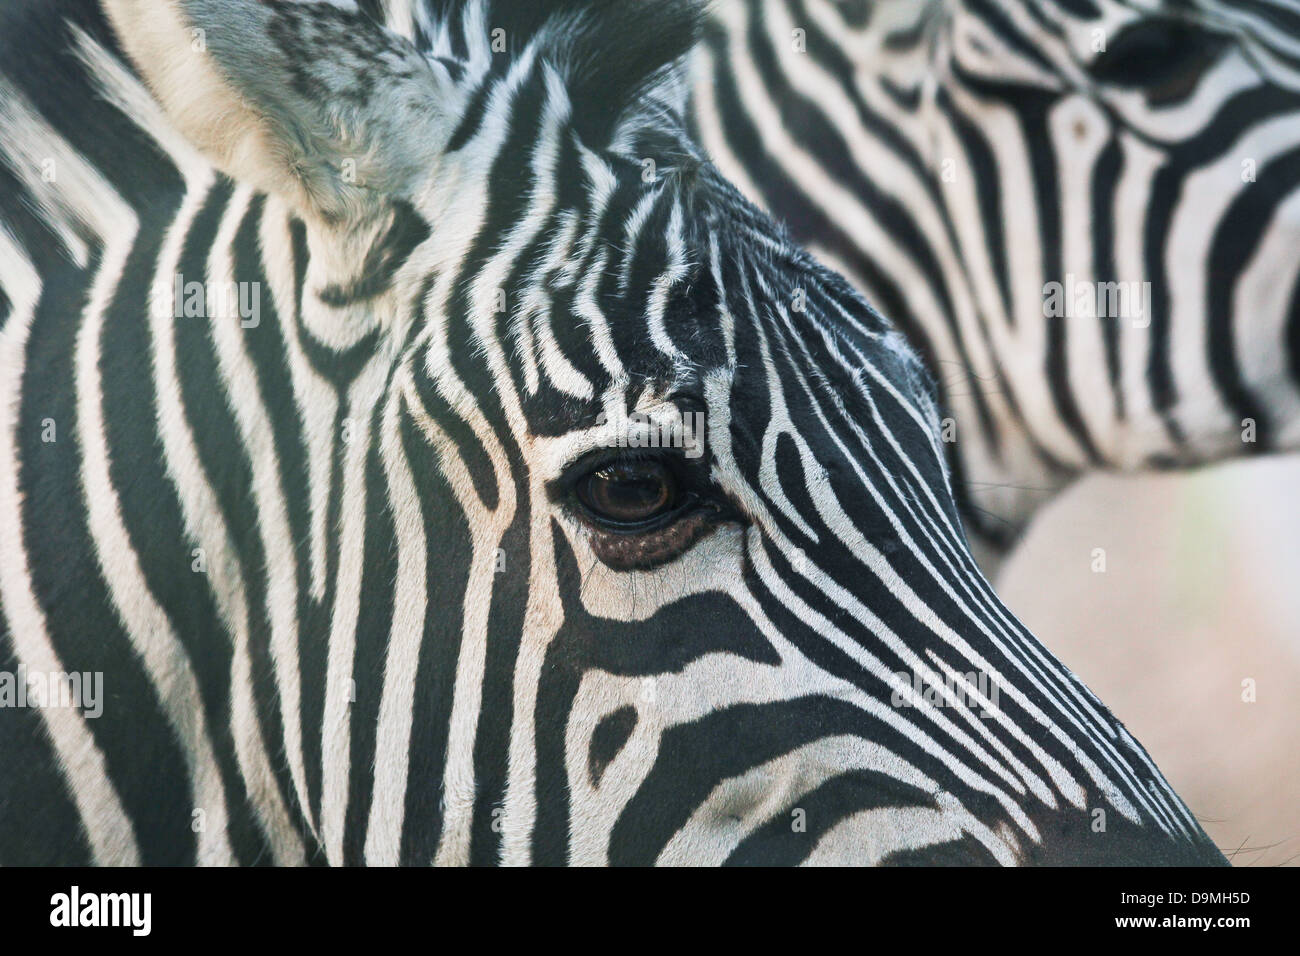 Zebra, ritratto, fauna selvatica, africa, strisce, zoo Immagini Stock